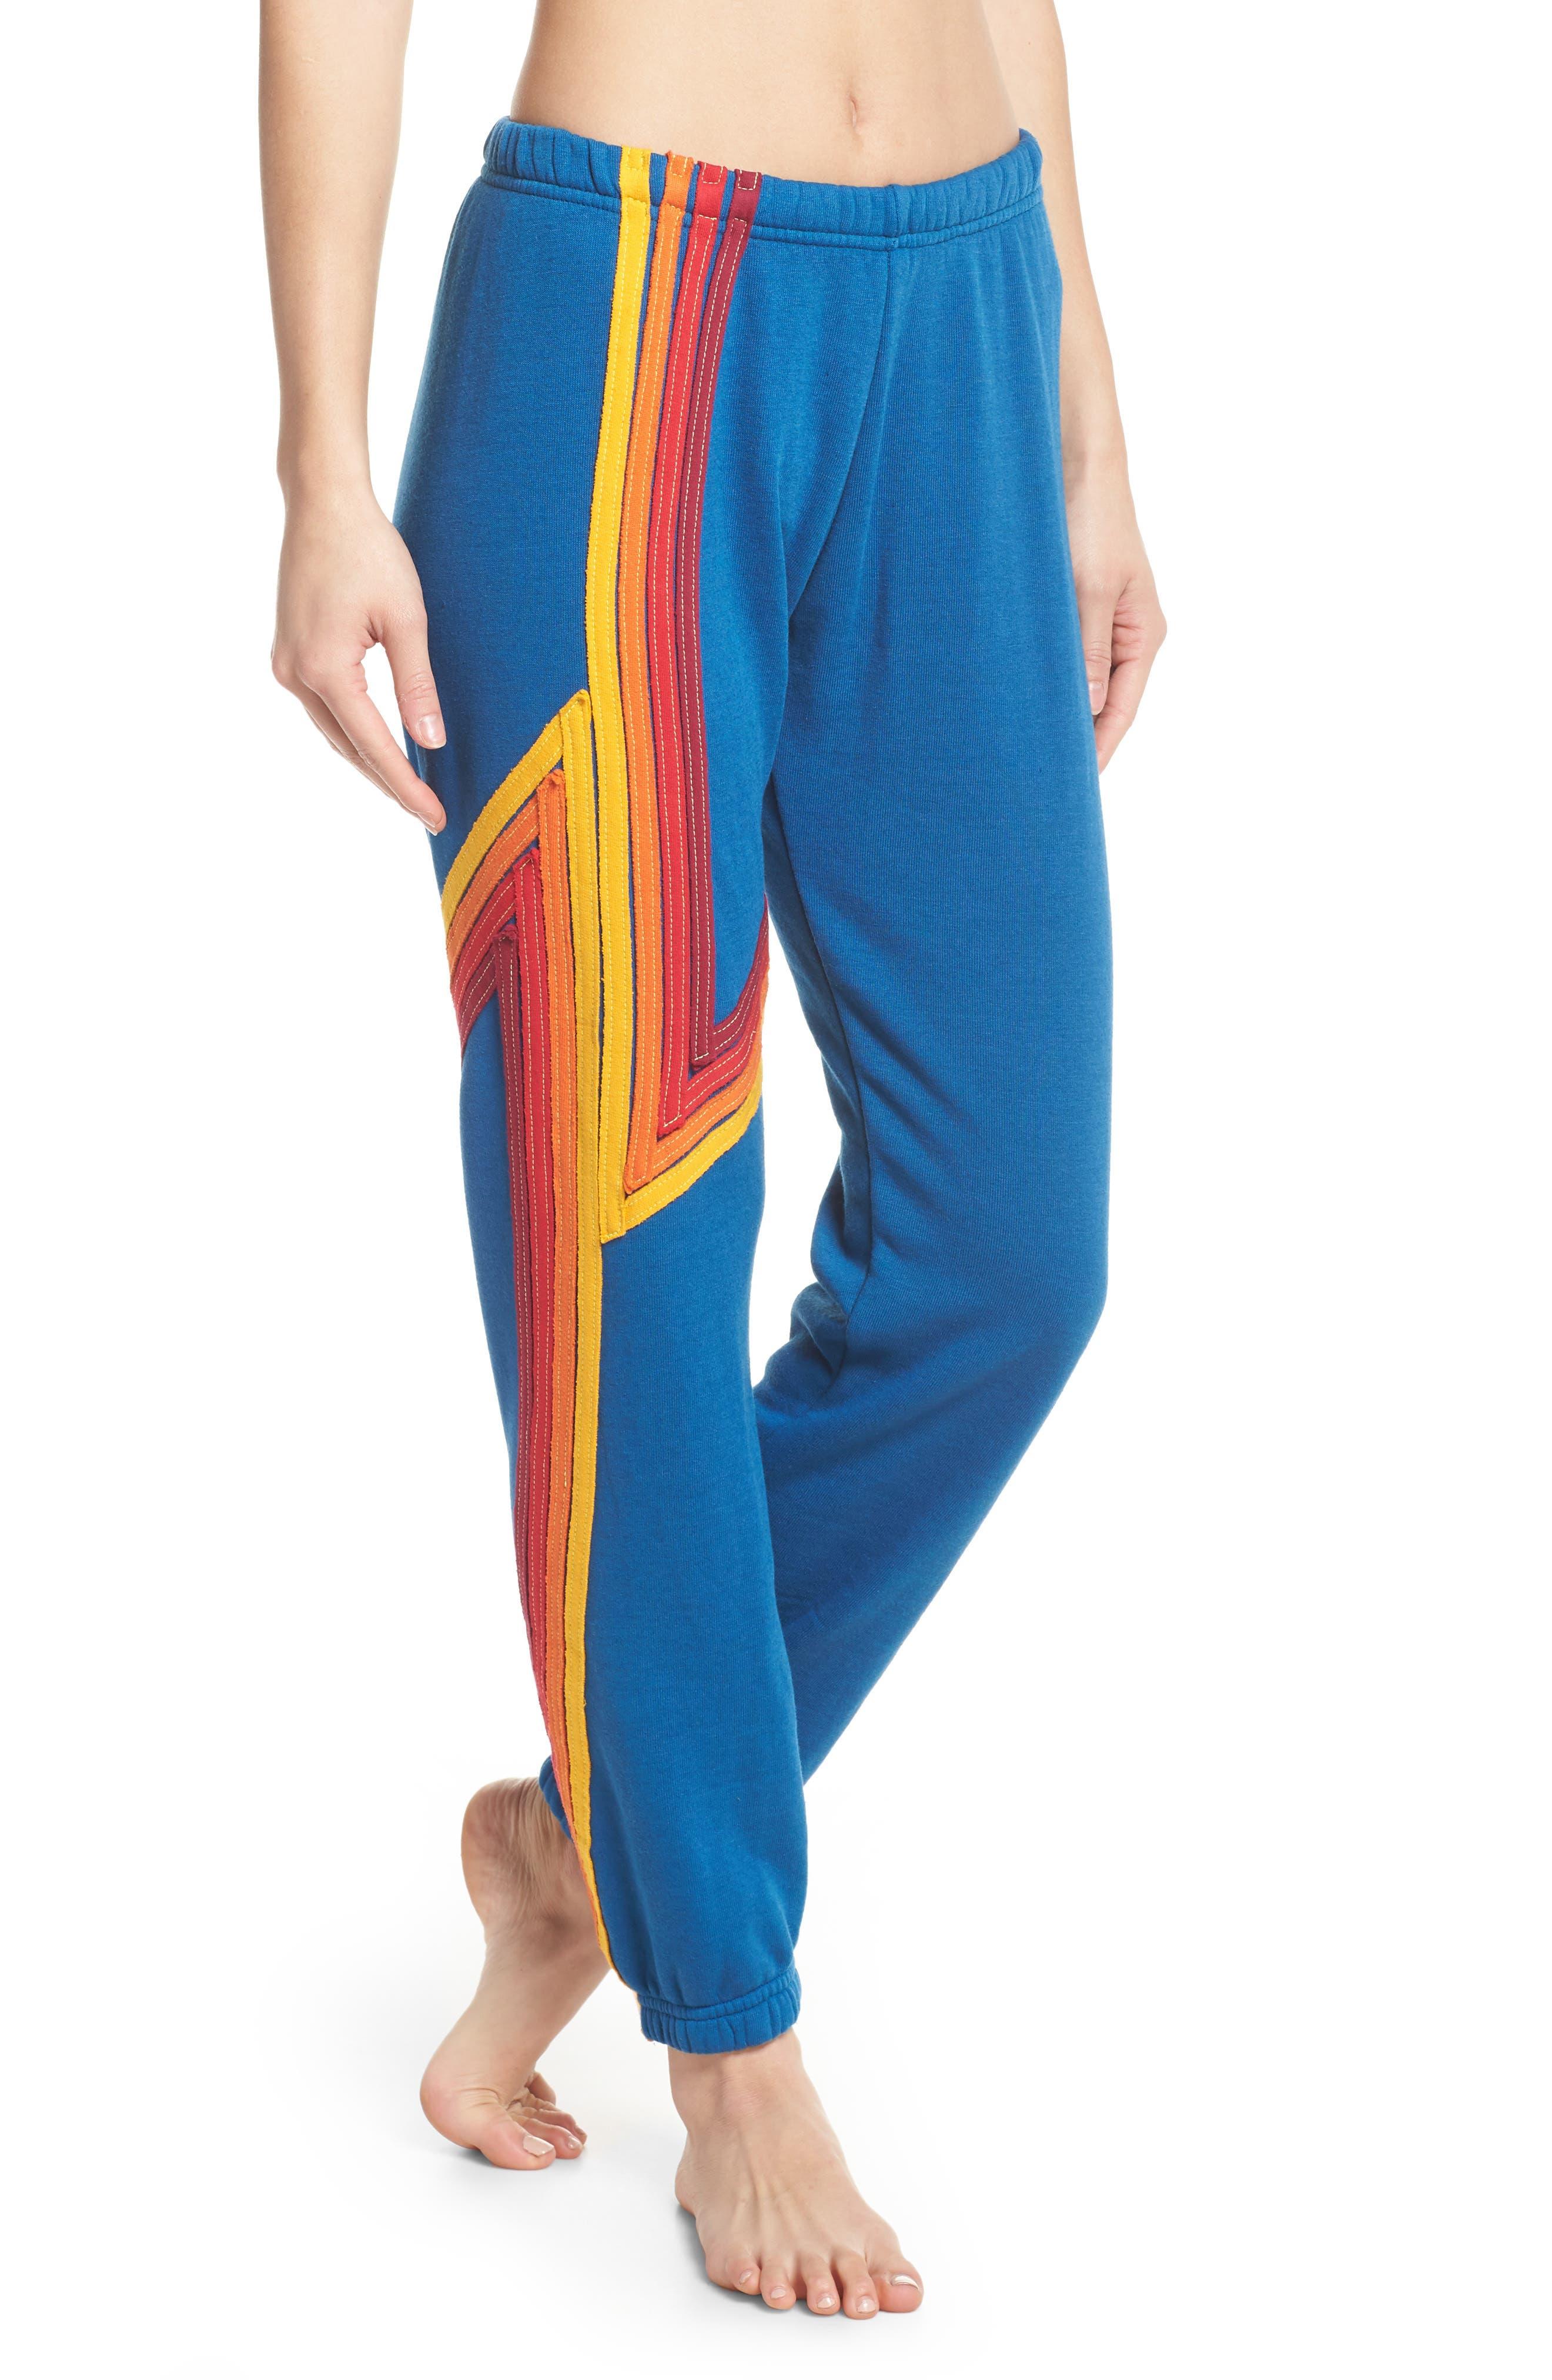 Blaze 4 Sweatpants,                         Main,                         color, Caribbean/ Red Stripe